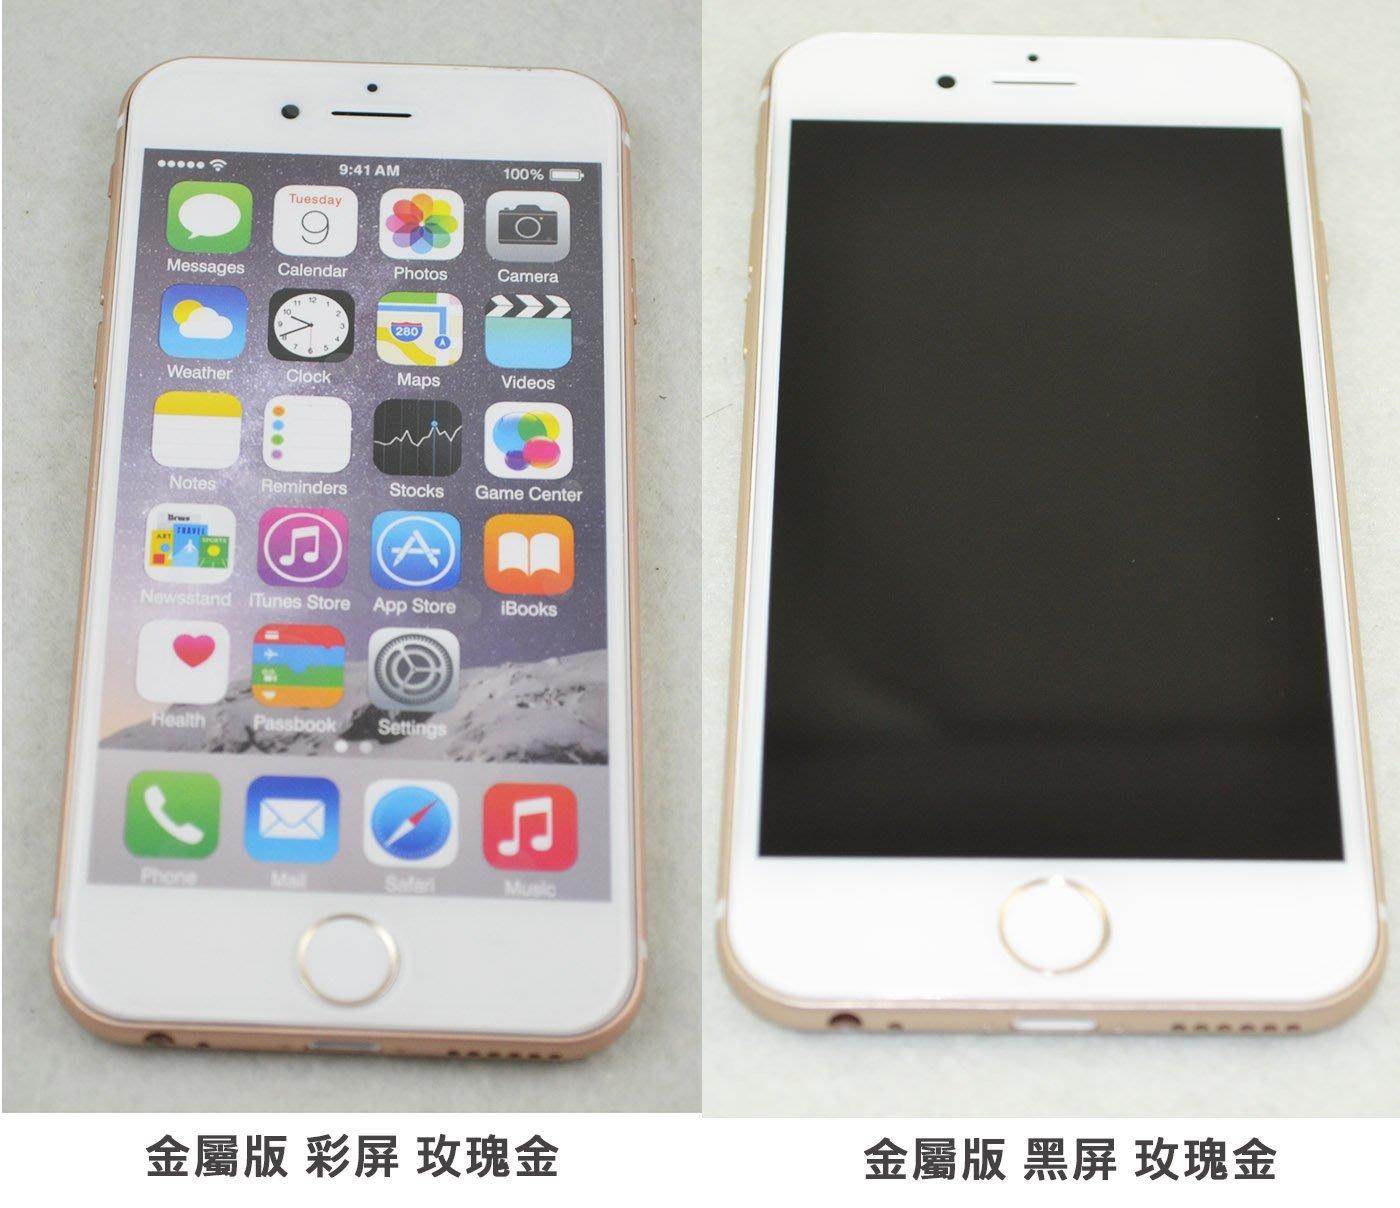 GooMea模型金屬版Apple蘋果iPhone 6S 6 展示機Dummy樣品包膜假機金色拍戲道具假機仿製1:1